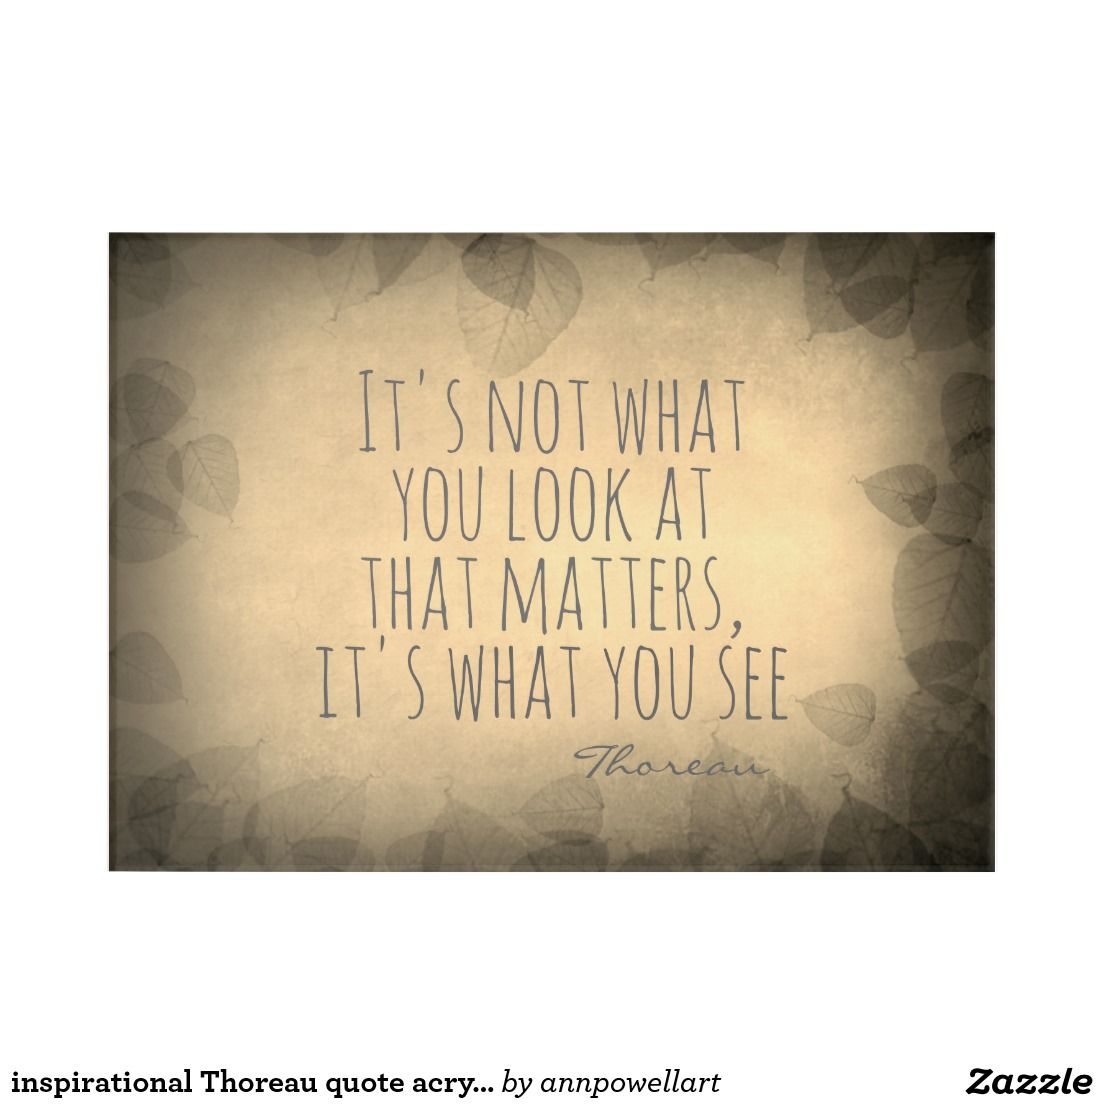 inspirational Thoreau quote acrylic panel print Acrylic Wall Art ...